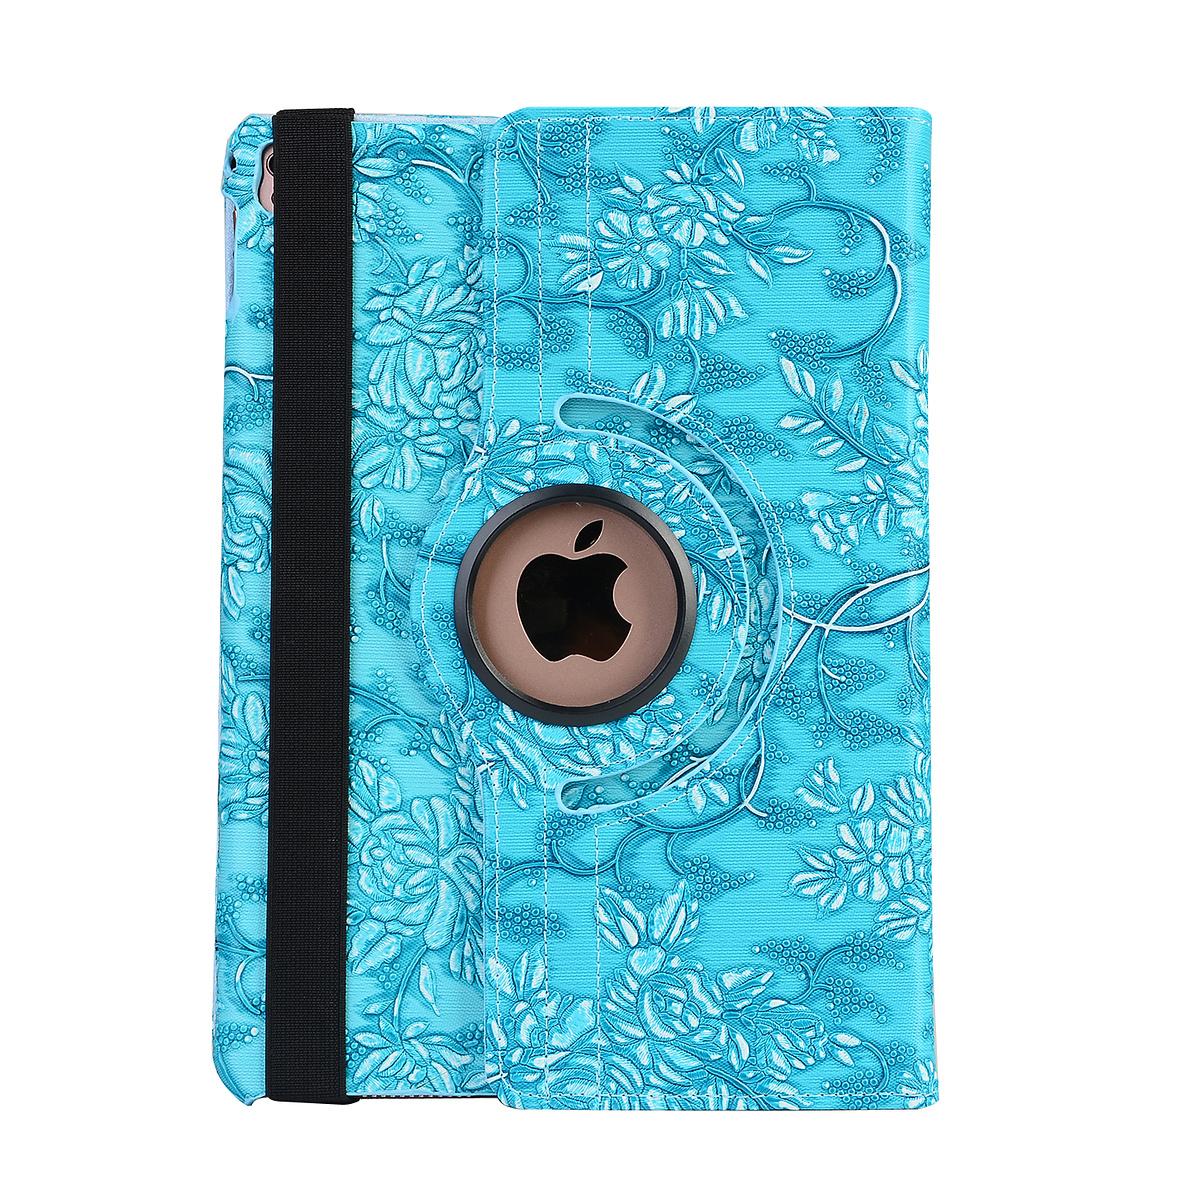 Läderfodral blommor blå, iPad Air 3, Pro 10.5